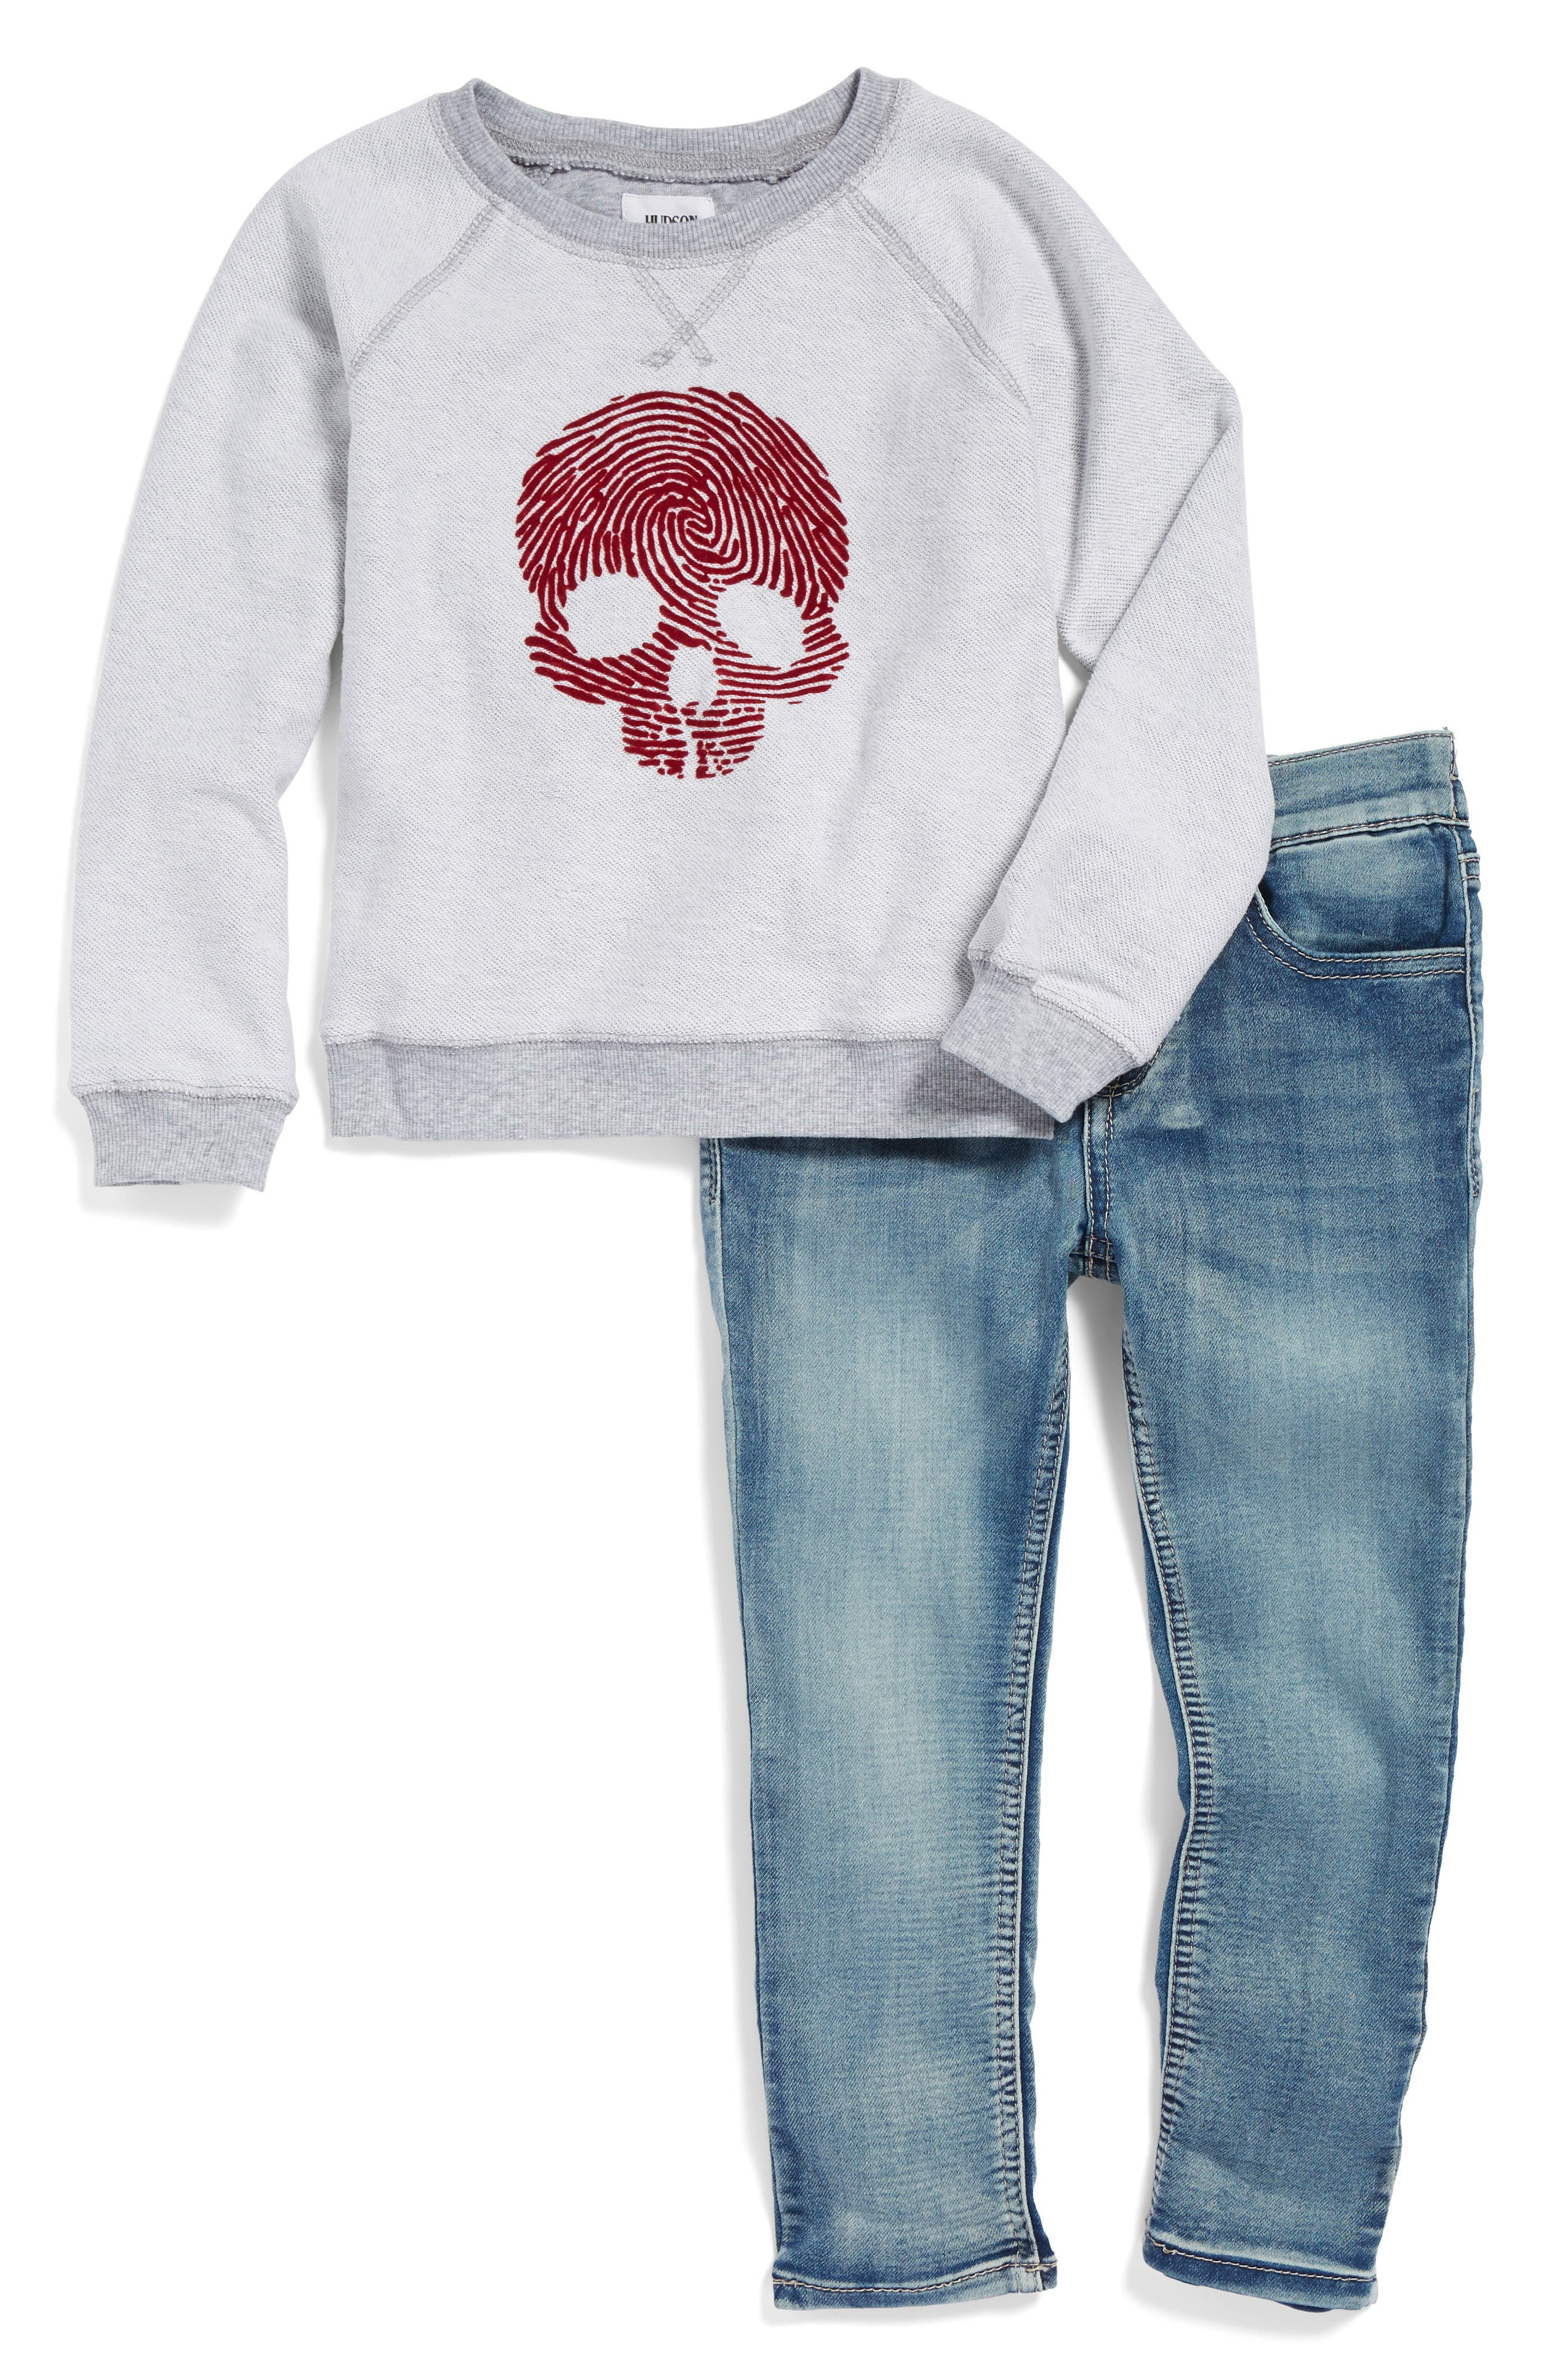 Hudson Skull Graphic French Terry Sweatshirt & Jeans Set (Toddler Boys)